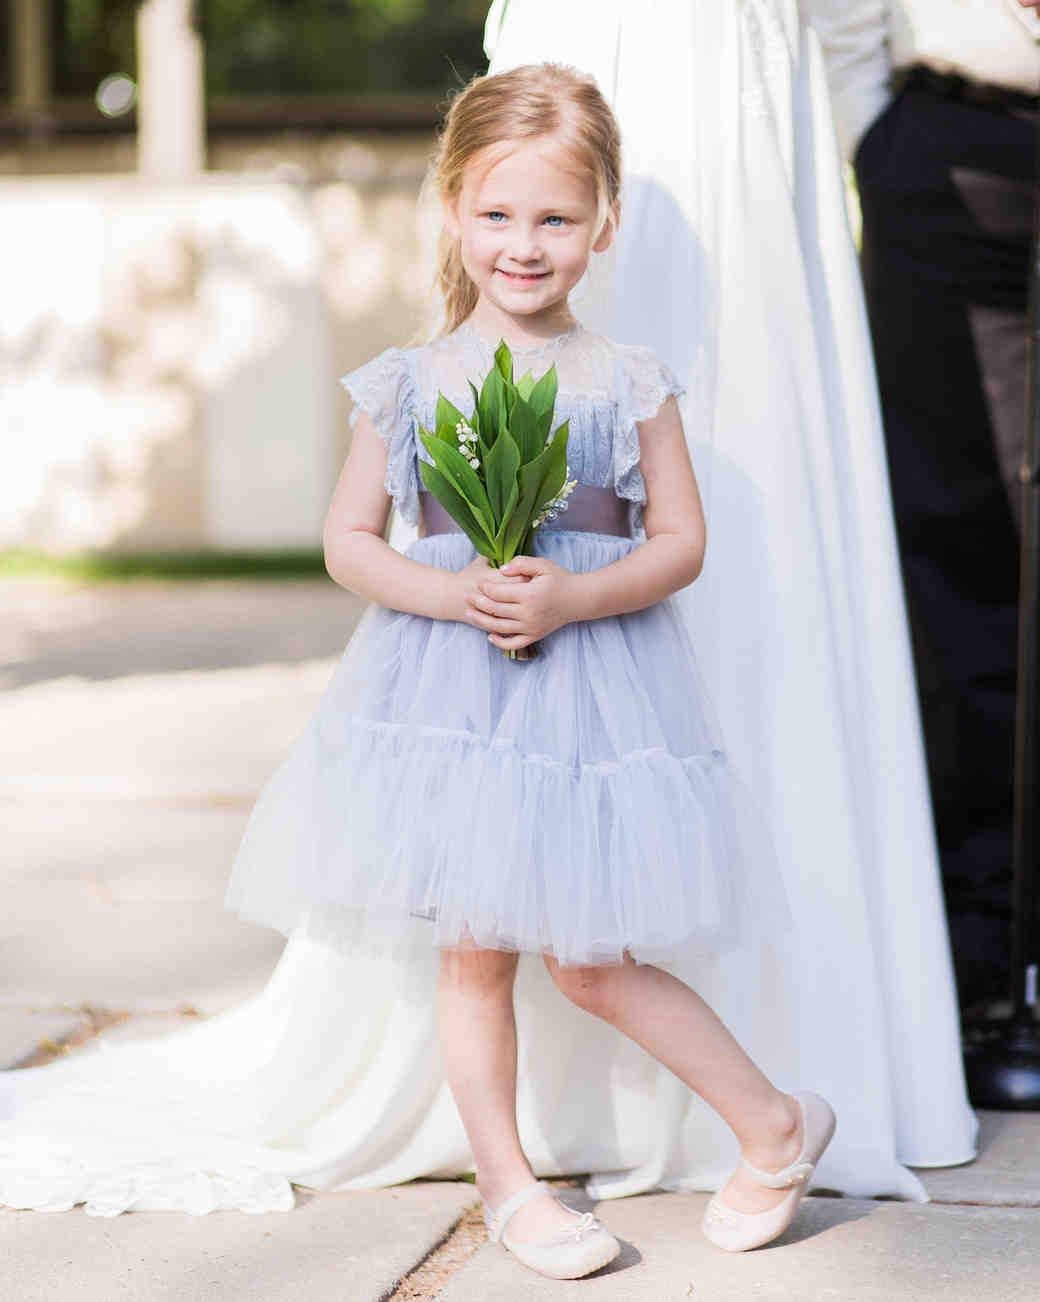 flower girl wearing light blue dress